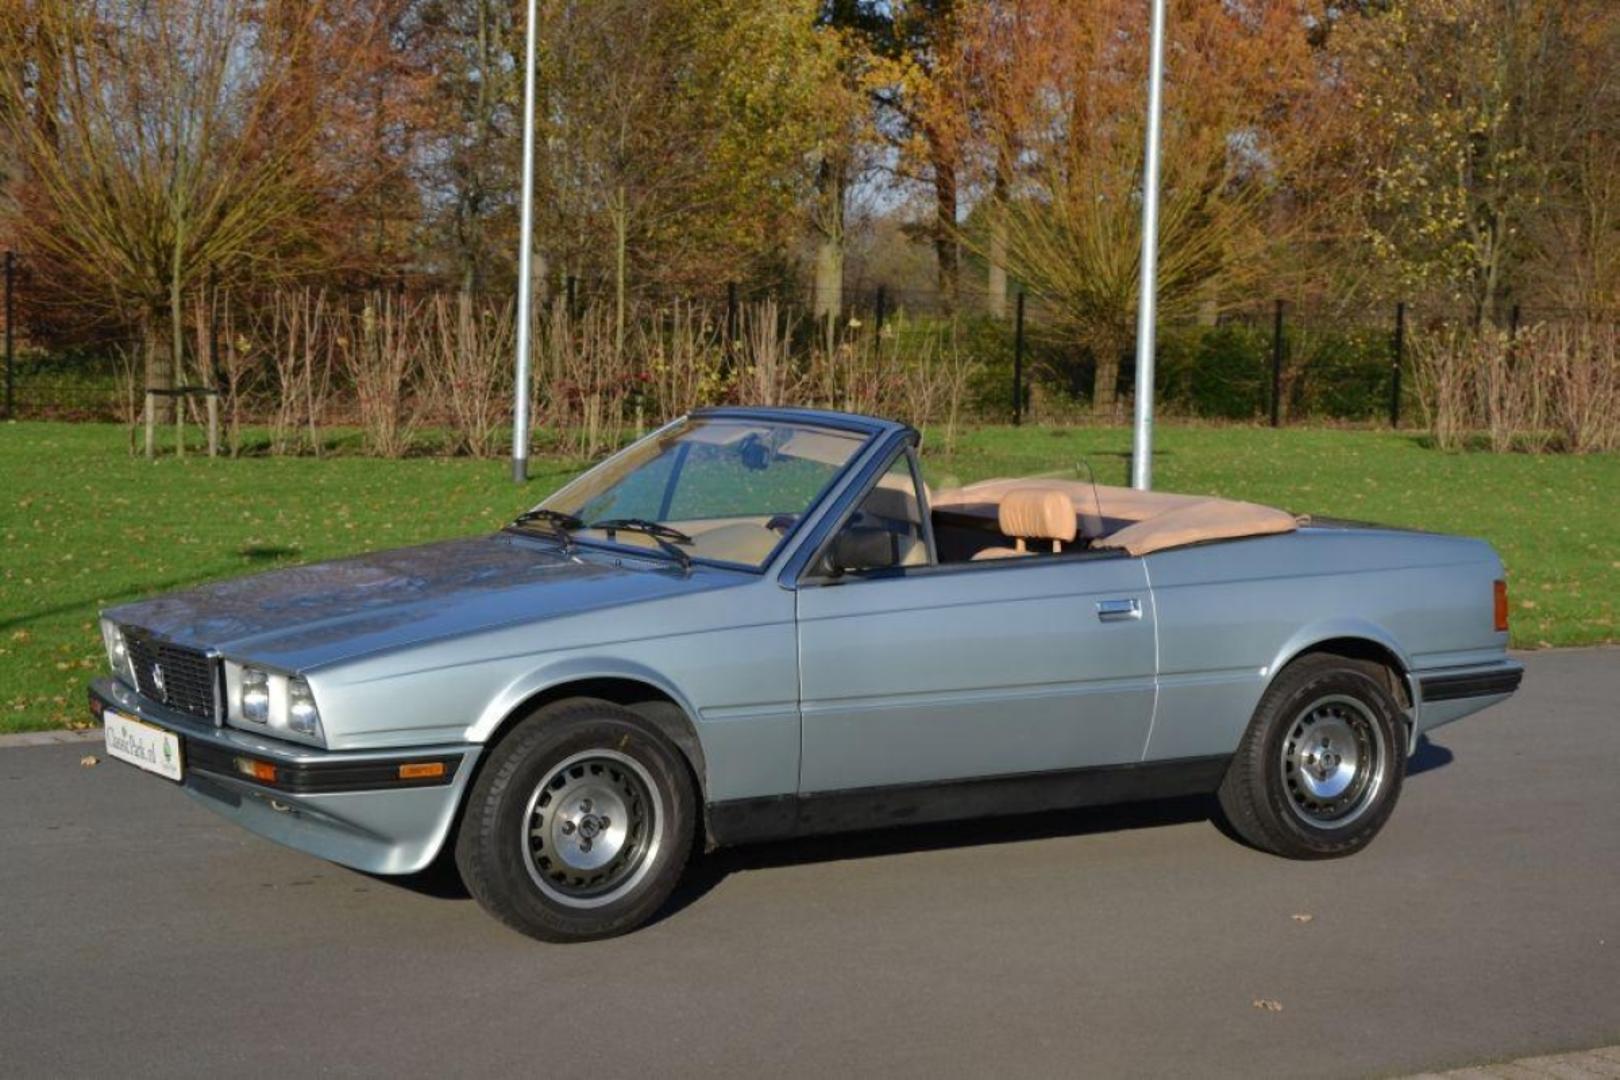 Maserati Biturbo 1981 - 1994 Cabriolet #2